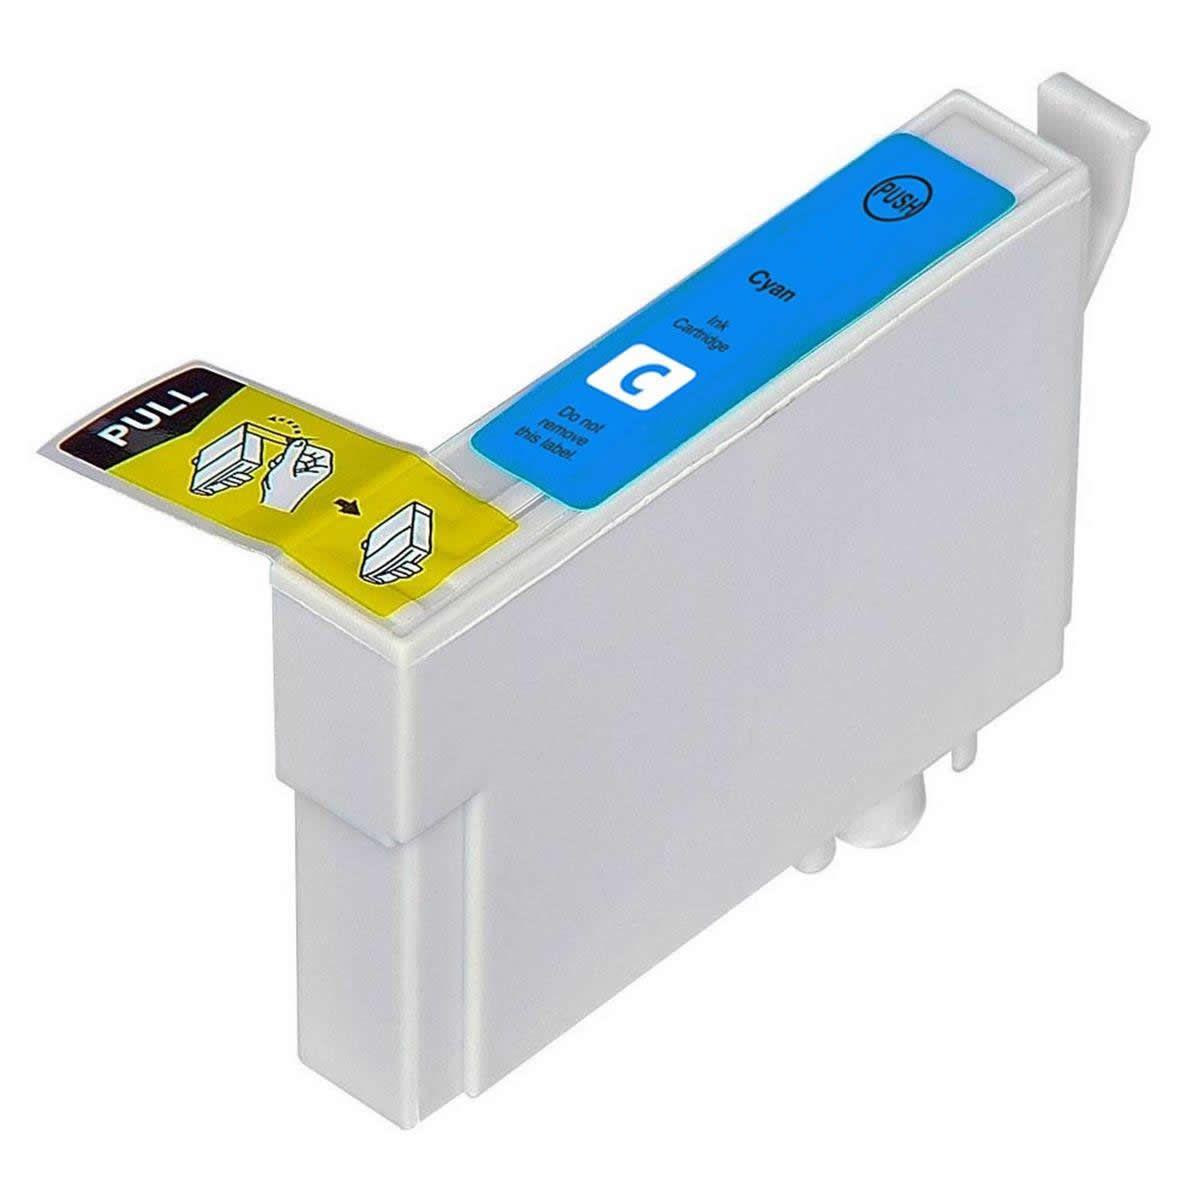 Cartucho MJ Compatível T194 T194220 Ciano 13.5ml para XP104 XP204 XP214 da EPSON